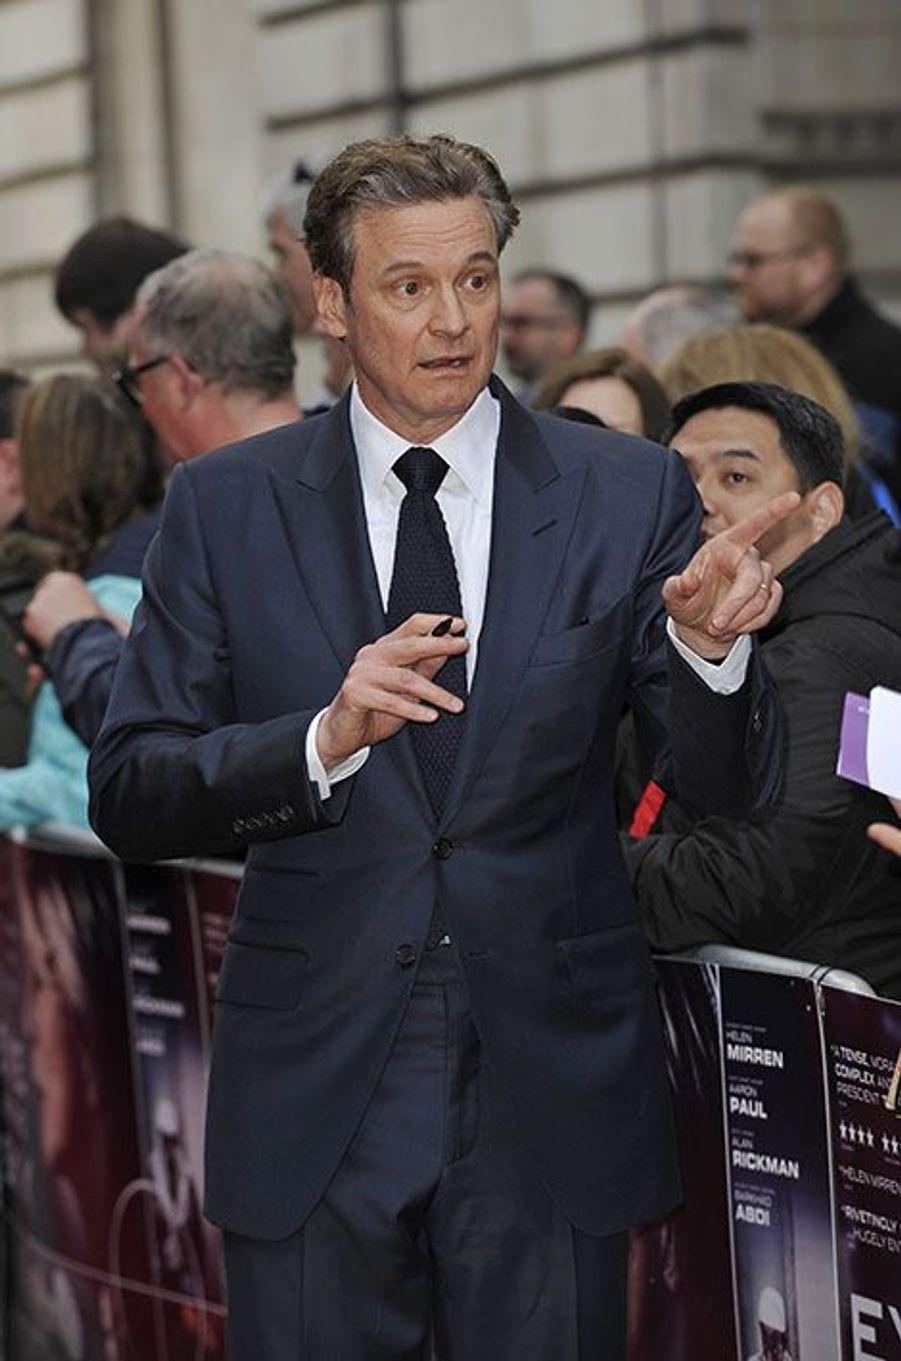 Colin Firth à Londres, le 11 avril 2016